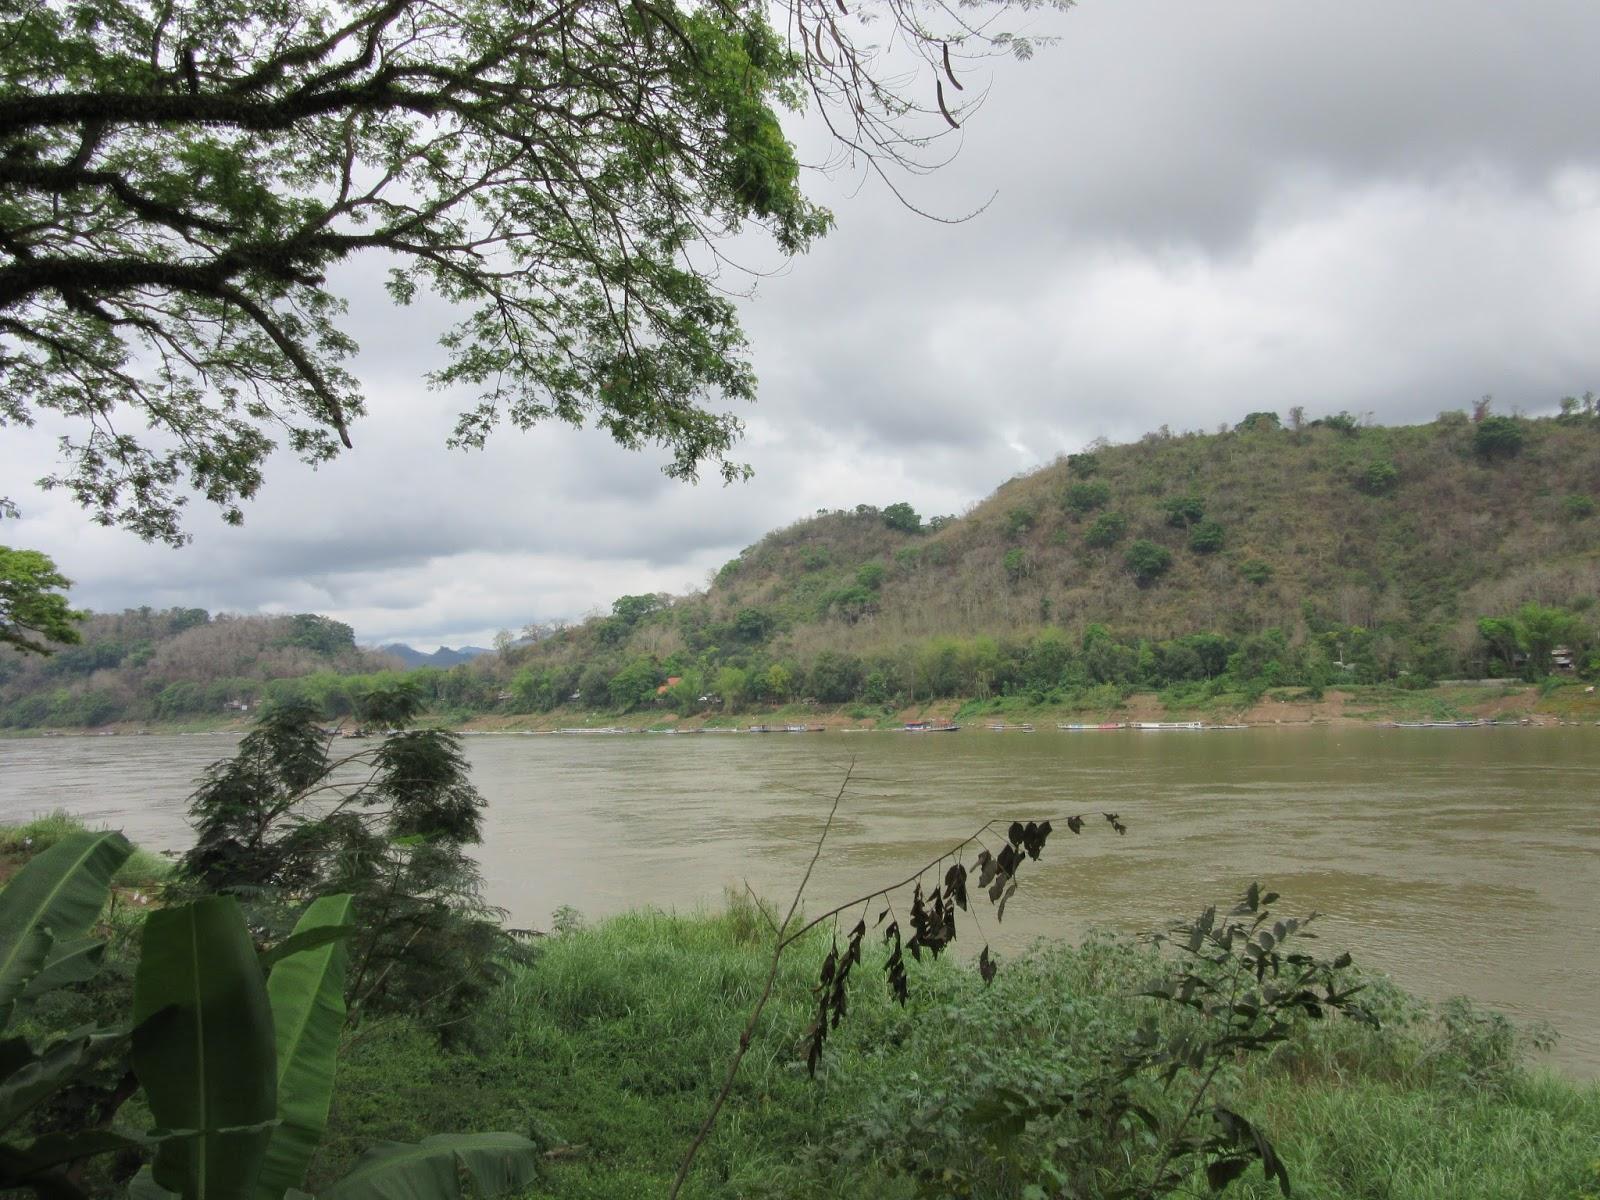 Río Mekong en Luang Prabang, Laos